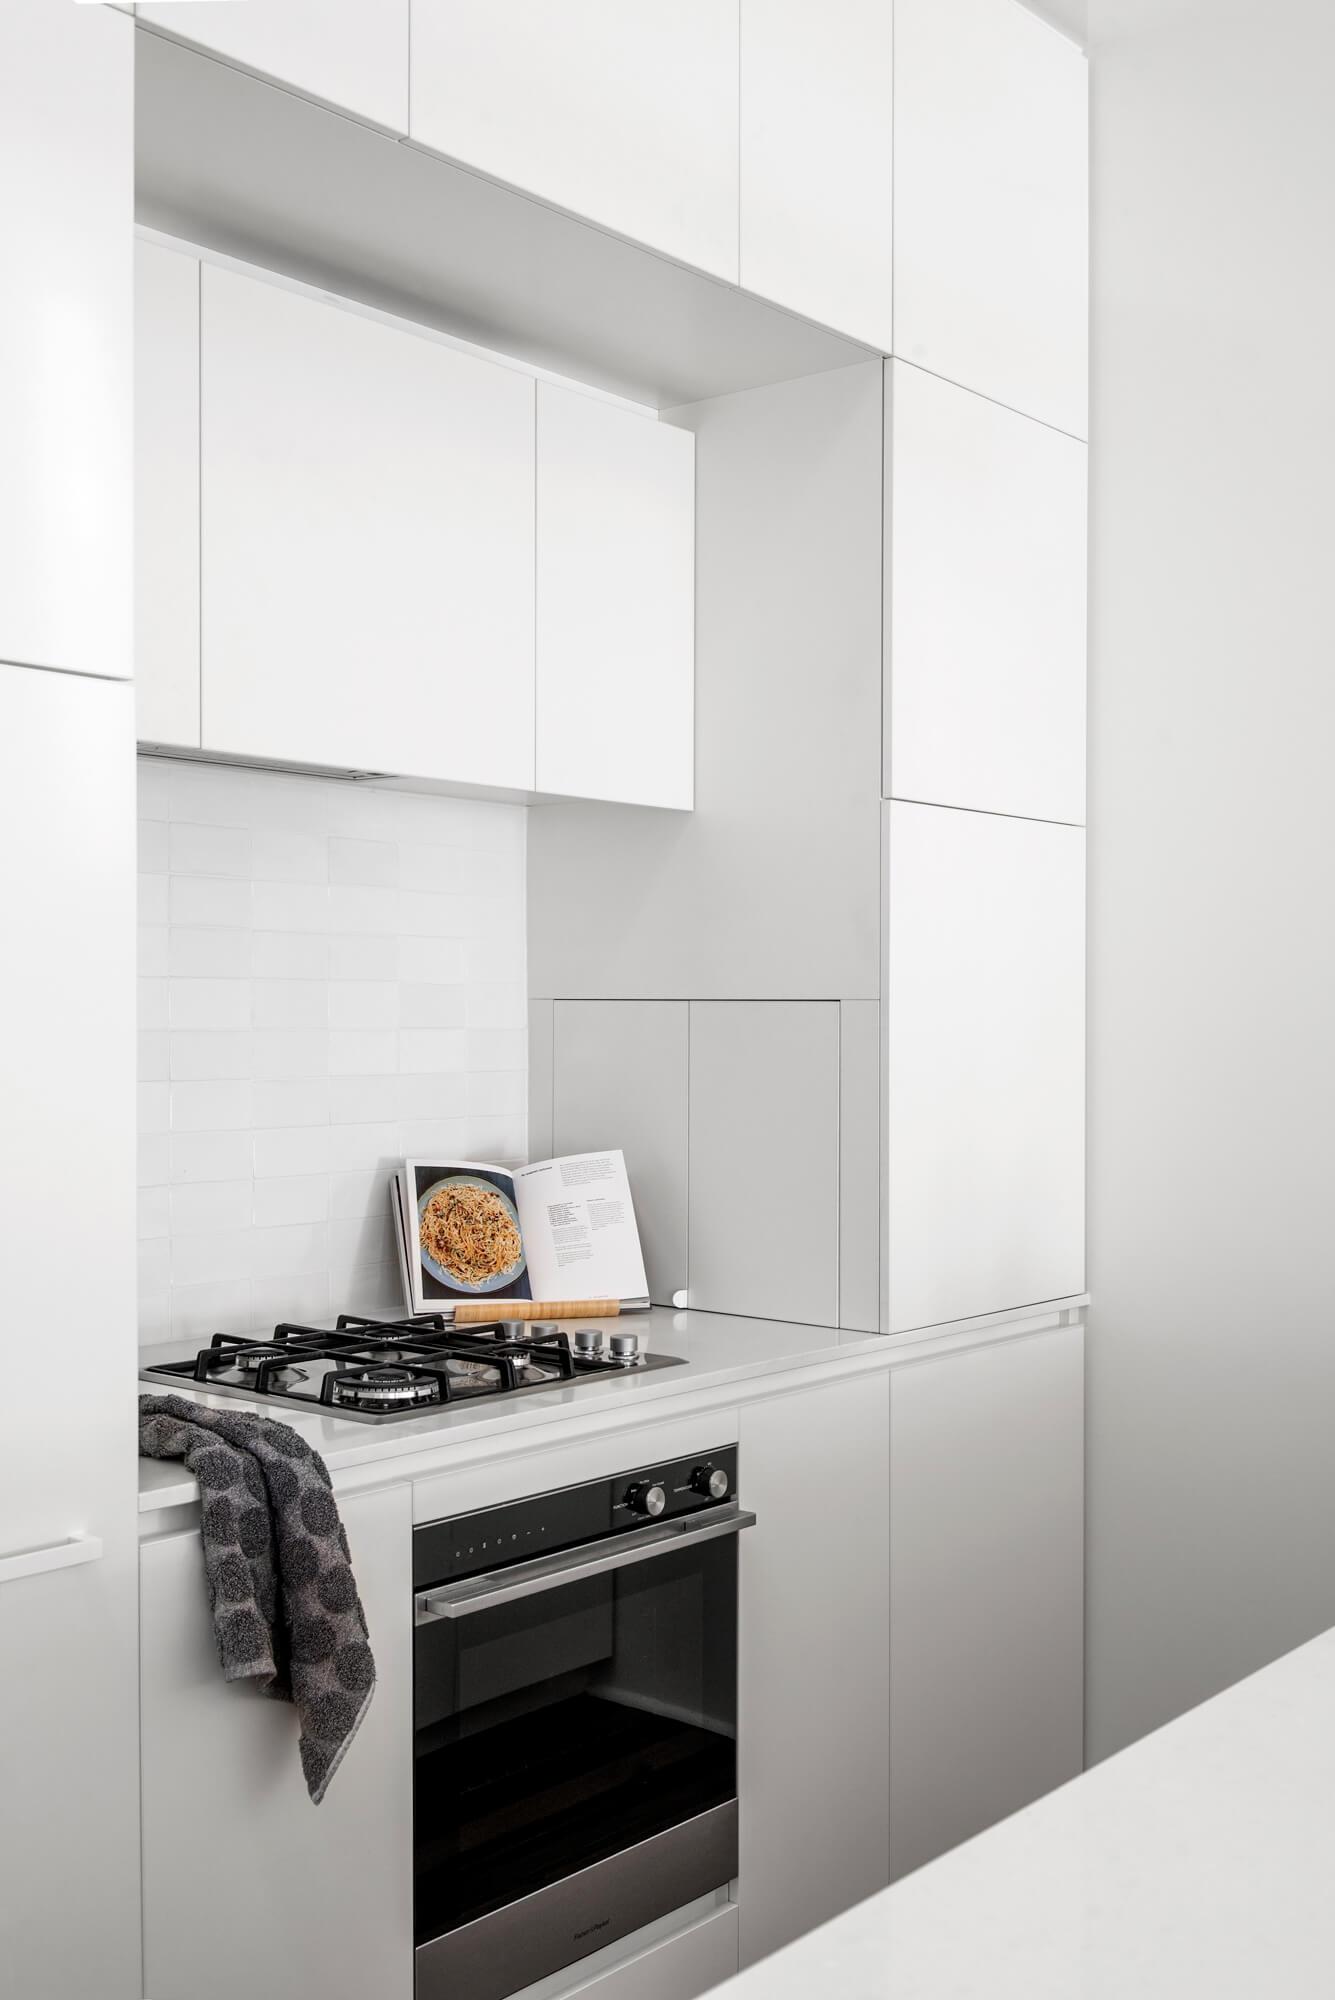 georgia-cannon-interior-designer-brisbane-project-m4-house-29.jpg